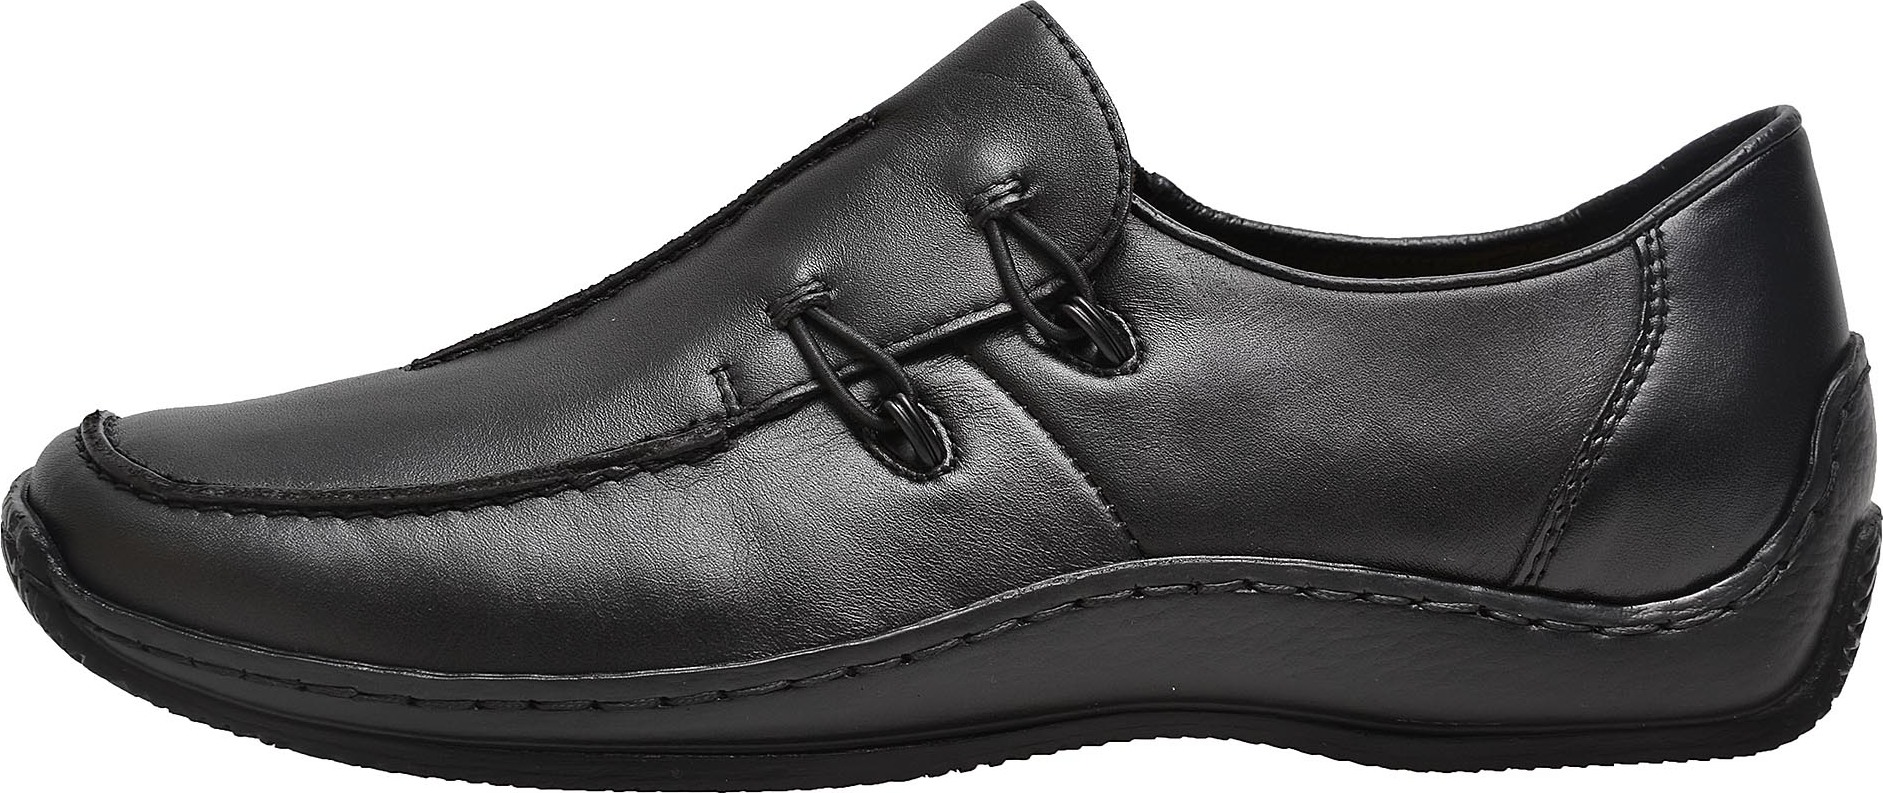 852d1e7a927f Dámská obuv RIEKER L1751 01 SCHWARZ H W 8 – Rieker Antistress